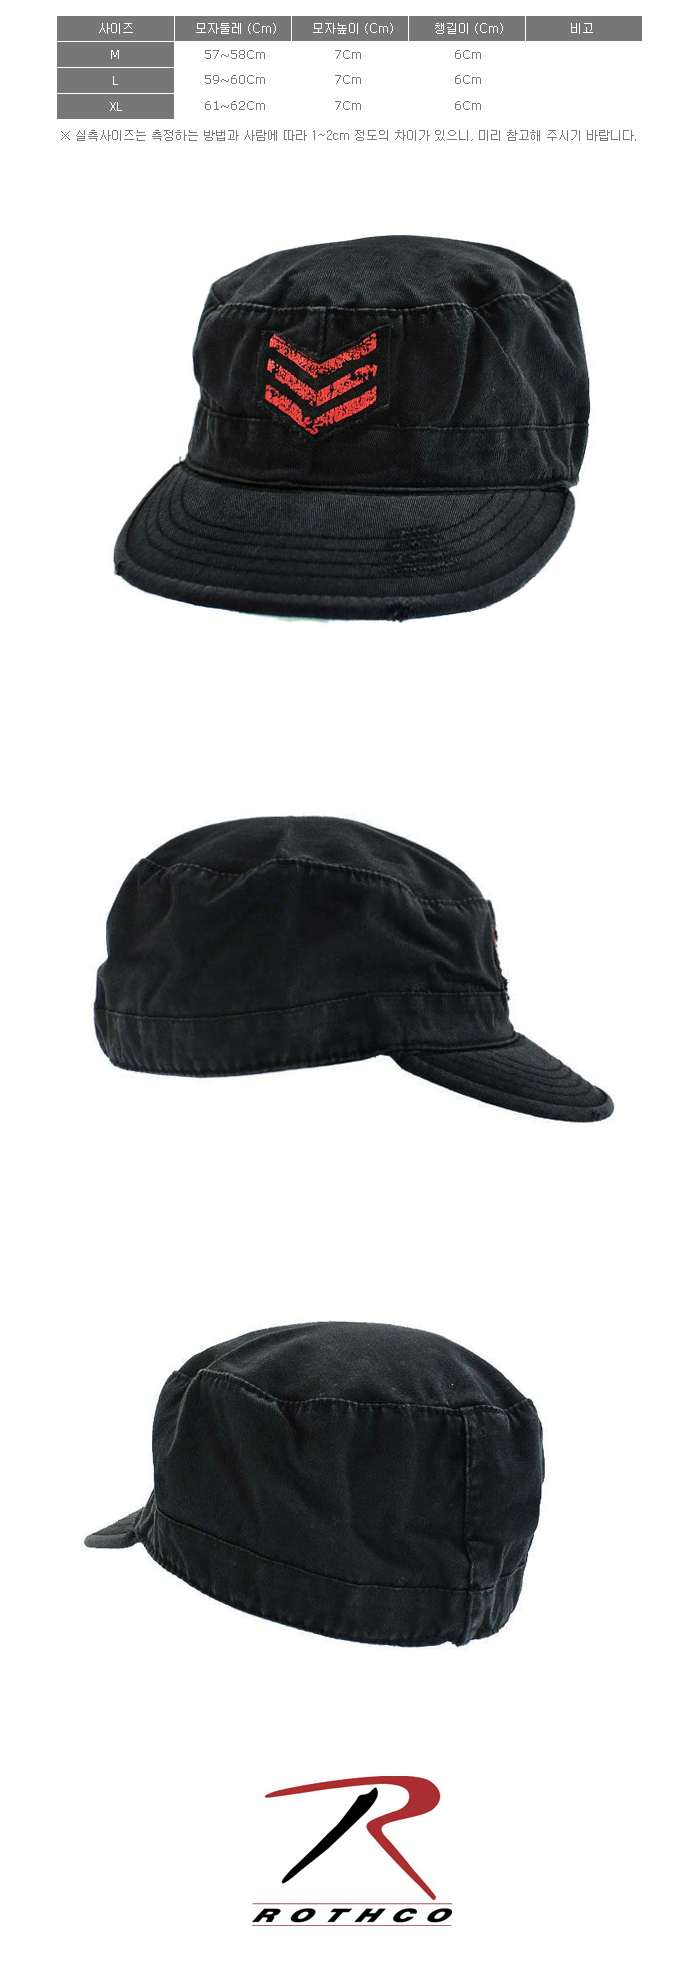 VINTAGE BLACK SGT STRIPES FATIGUE CAP